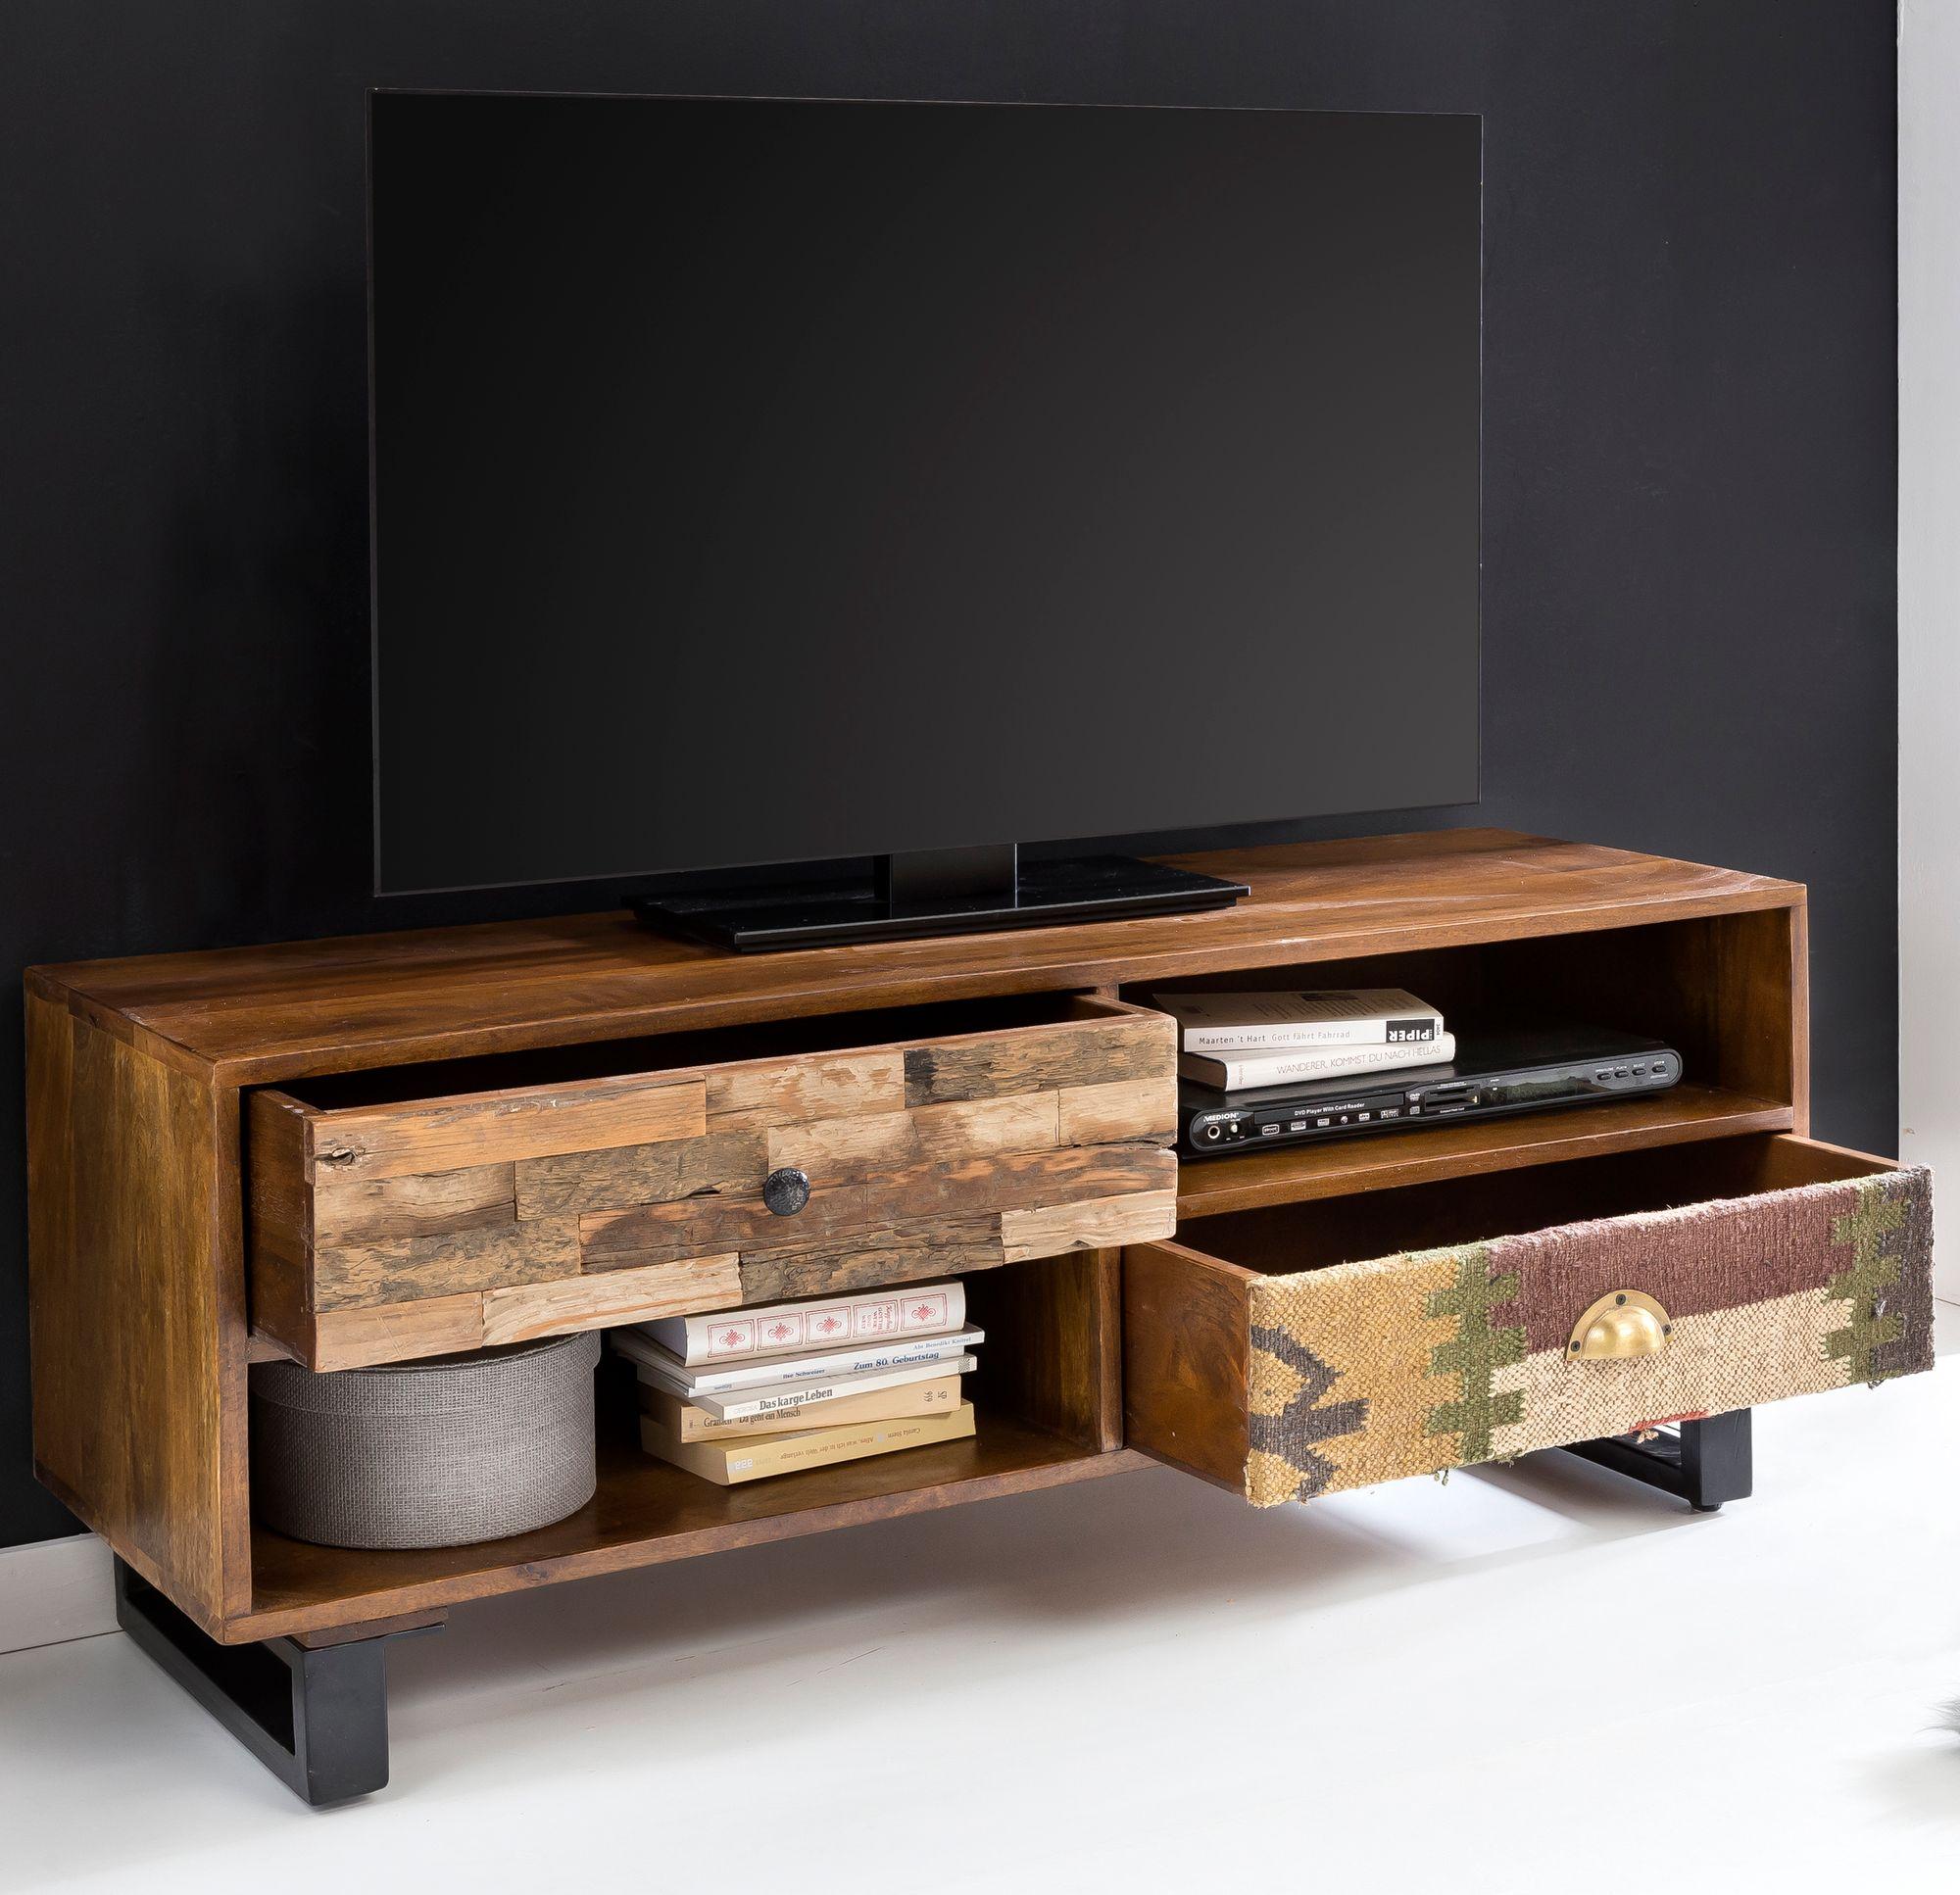 Fine Tv Lowboard Kanpur 120 Cm Schubladen Hifi Regal Fernseher Kommode Holz